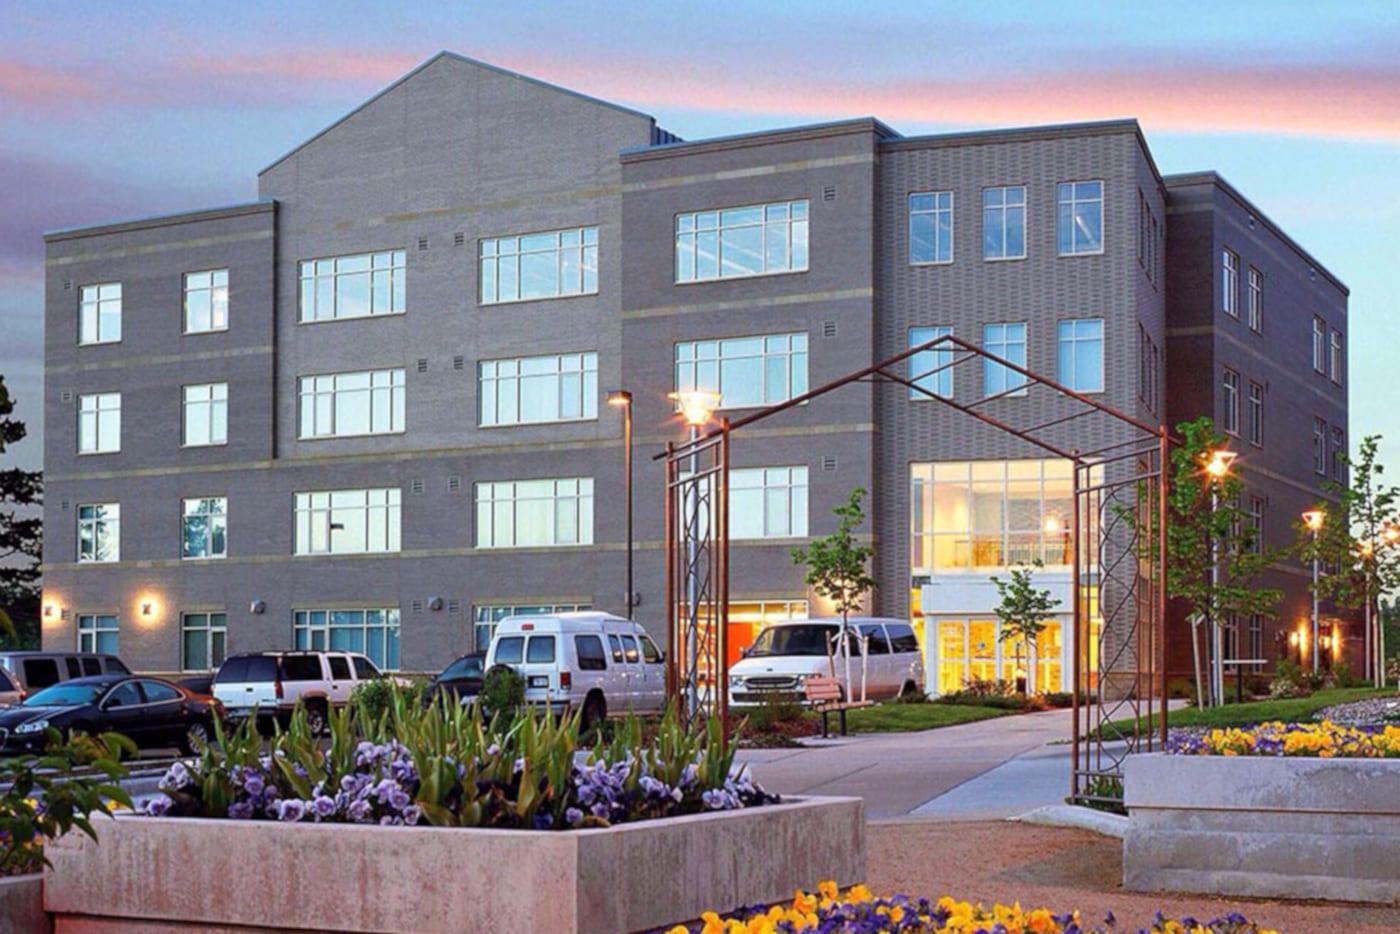 Colorado Sanitarium Craig Hospital Family Housing Englewood